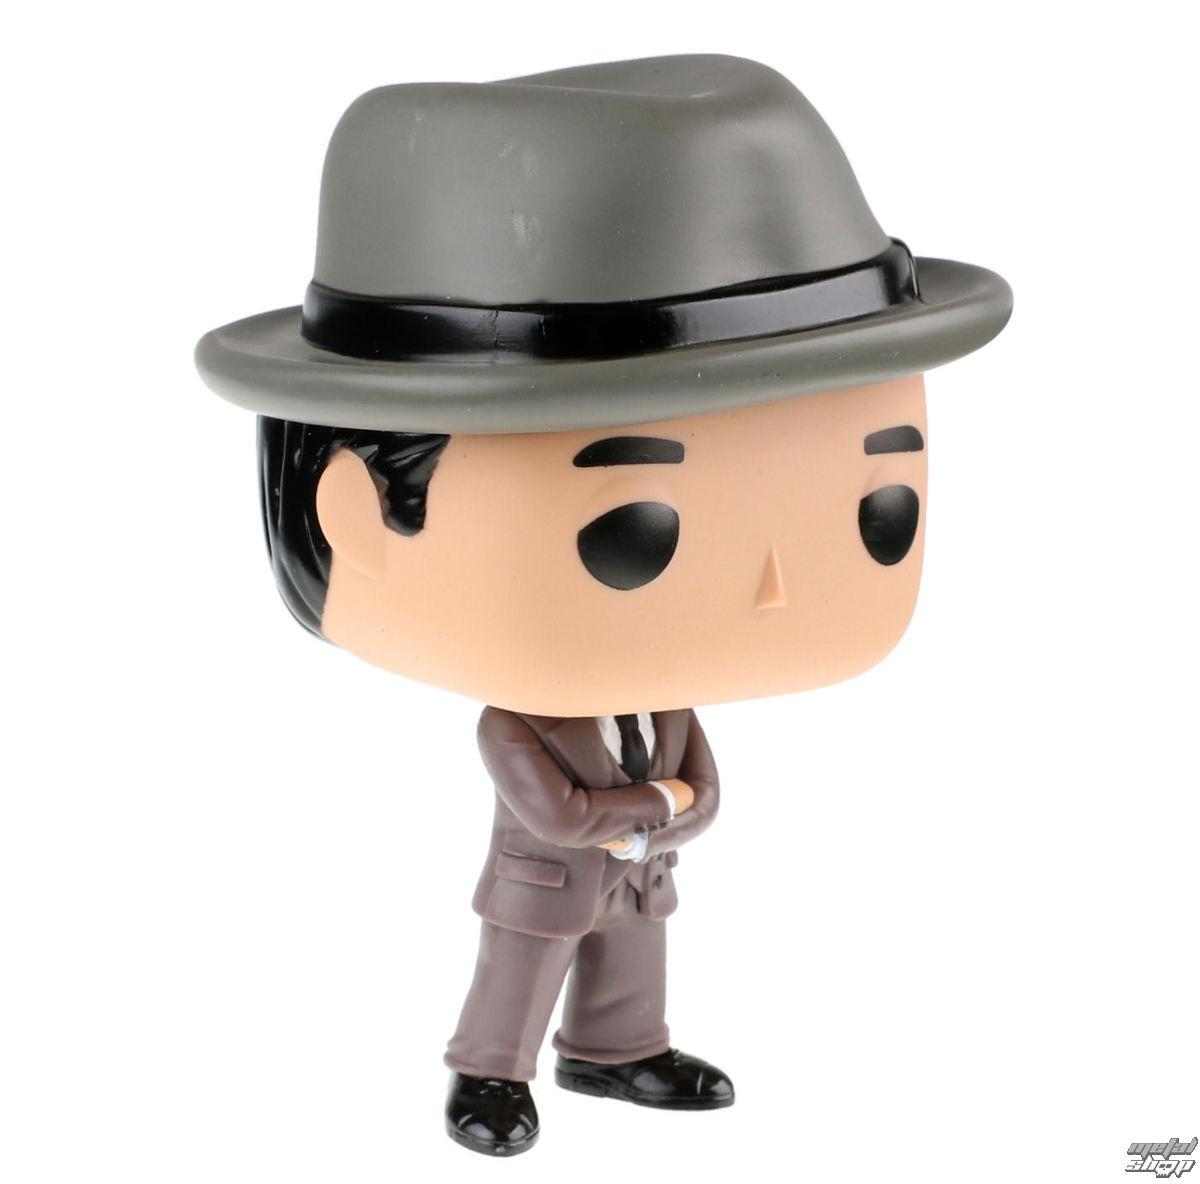 ca85e0700a61c figurine Kmotr POP! - The Godfather - Michael Corleone - FK13528 ...